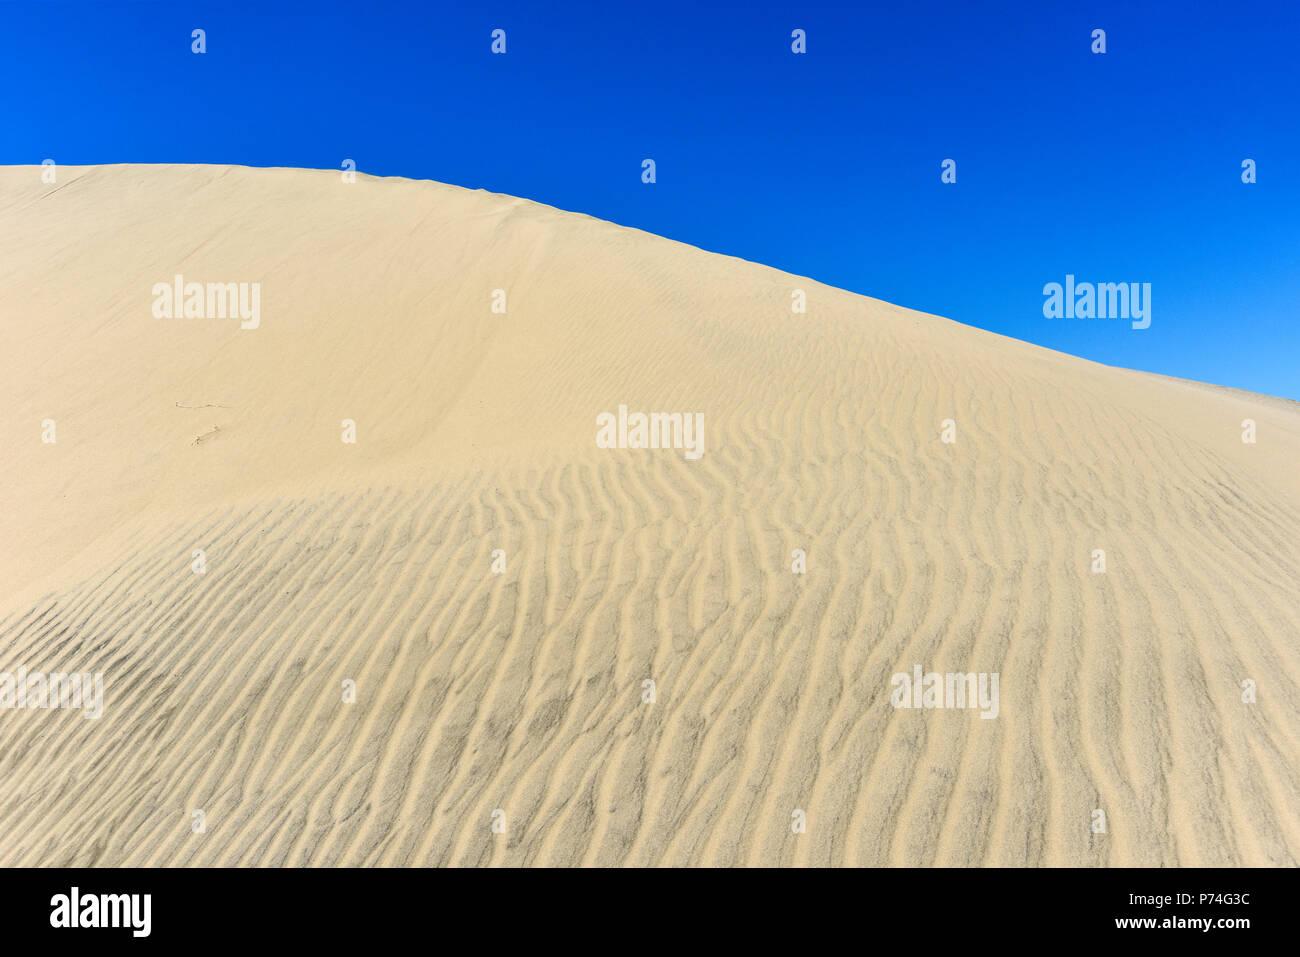 Der Oregon Sand Dünen in Florenz, Oregon, USA Stockbild